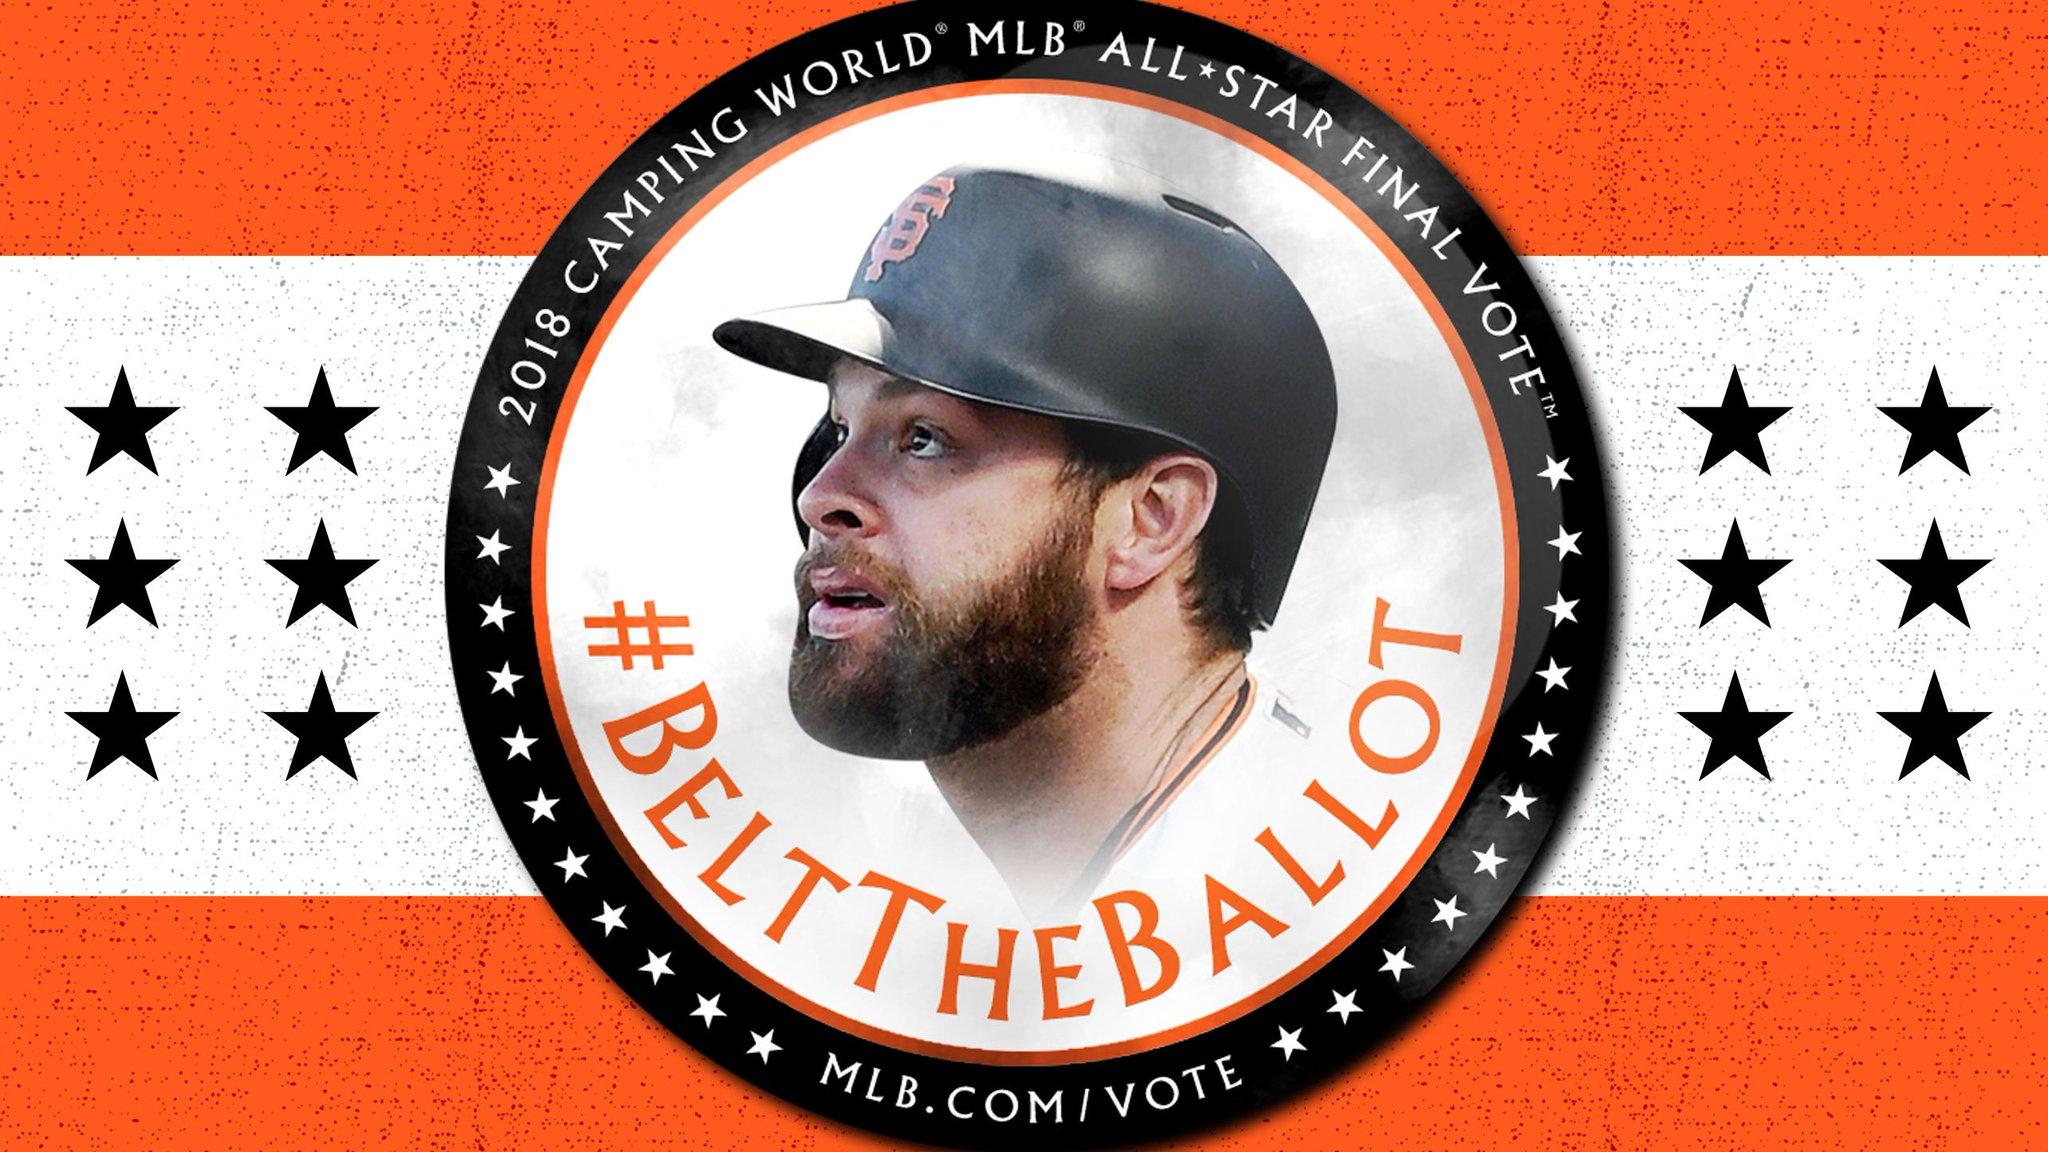 It's simple, really: just keep voting!  https://t.co/51LAfiSrjq  #BeltTheBallot https://t.co/ZO5gUCpnMw